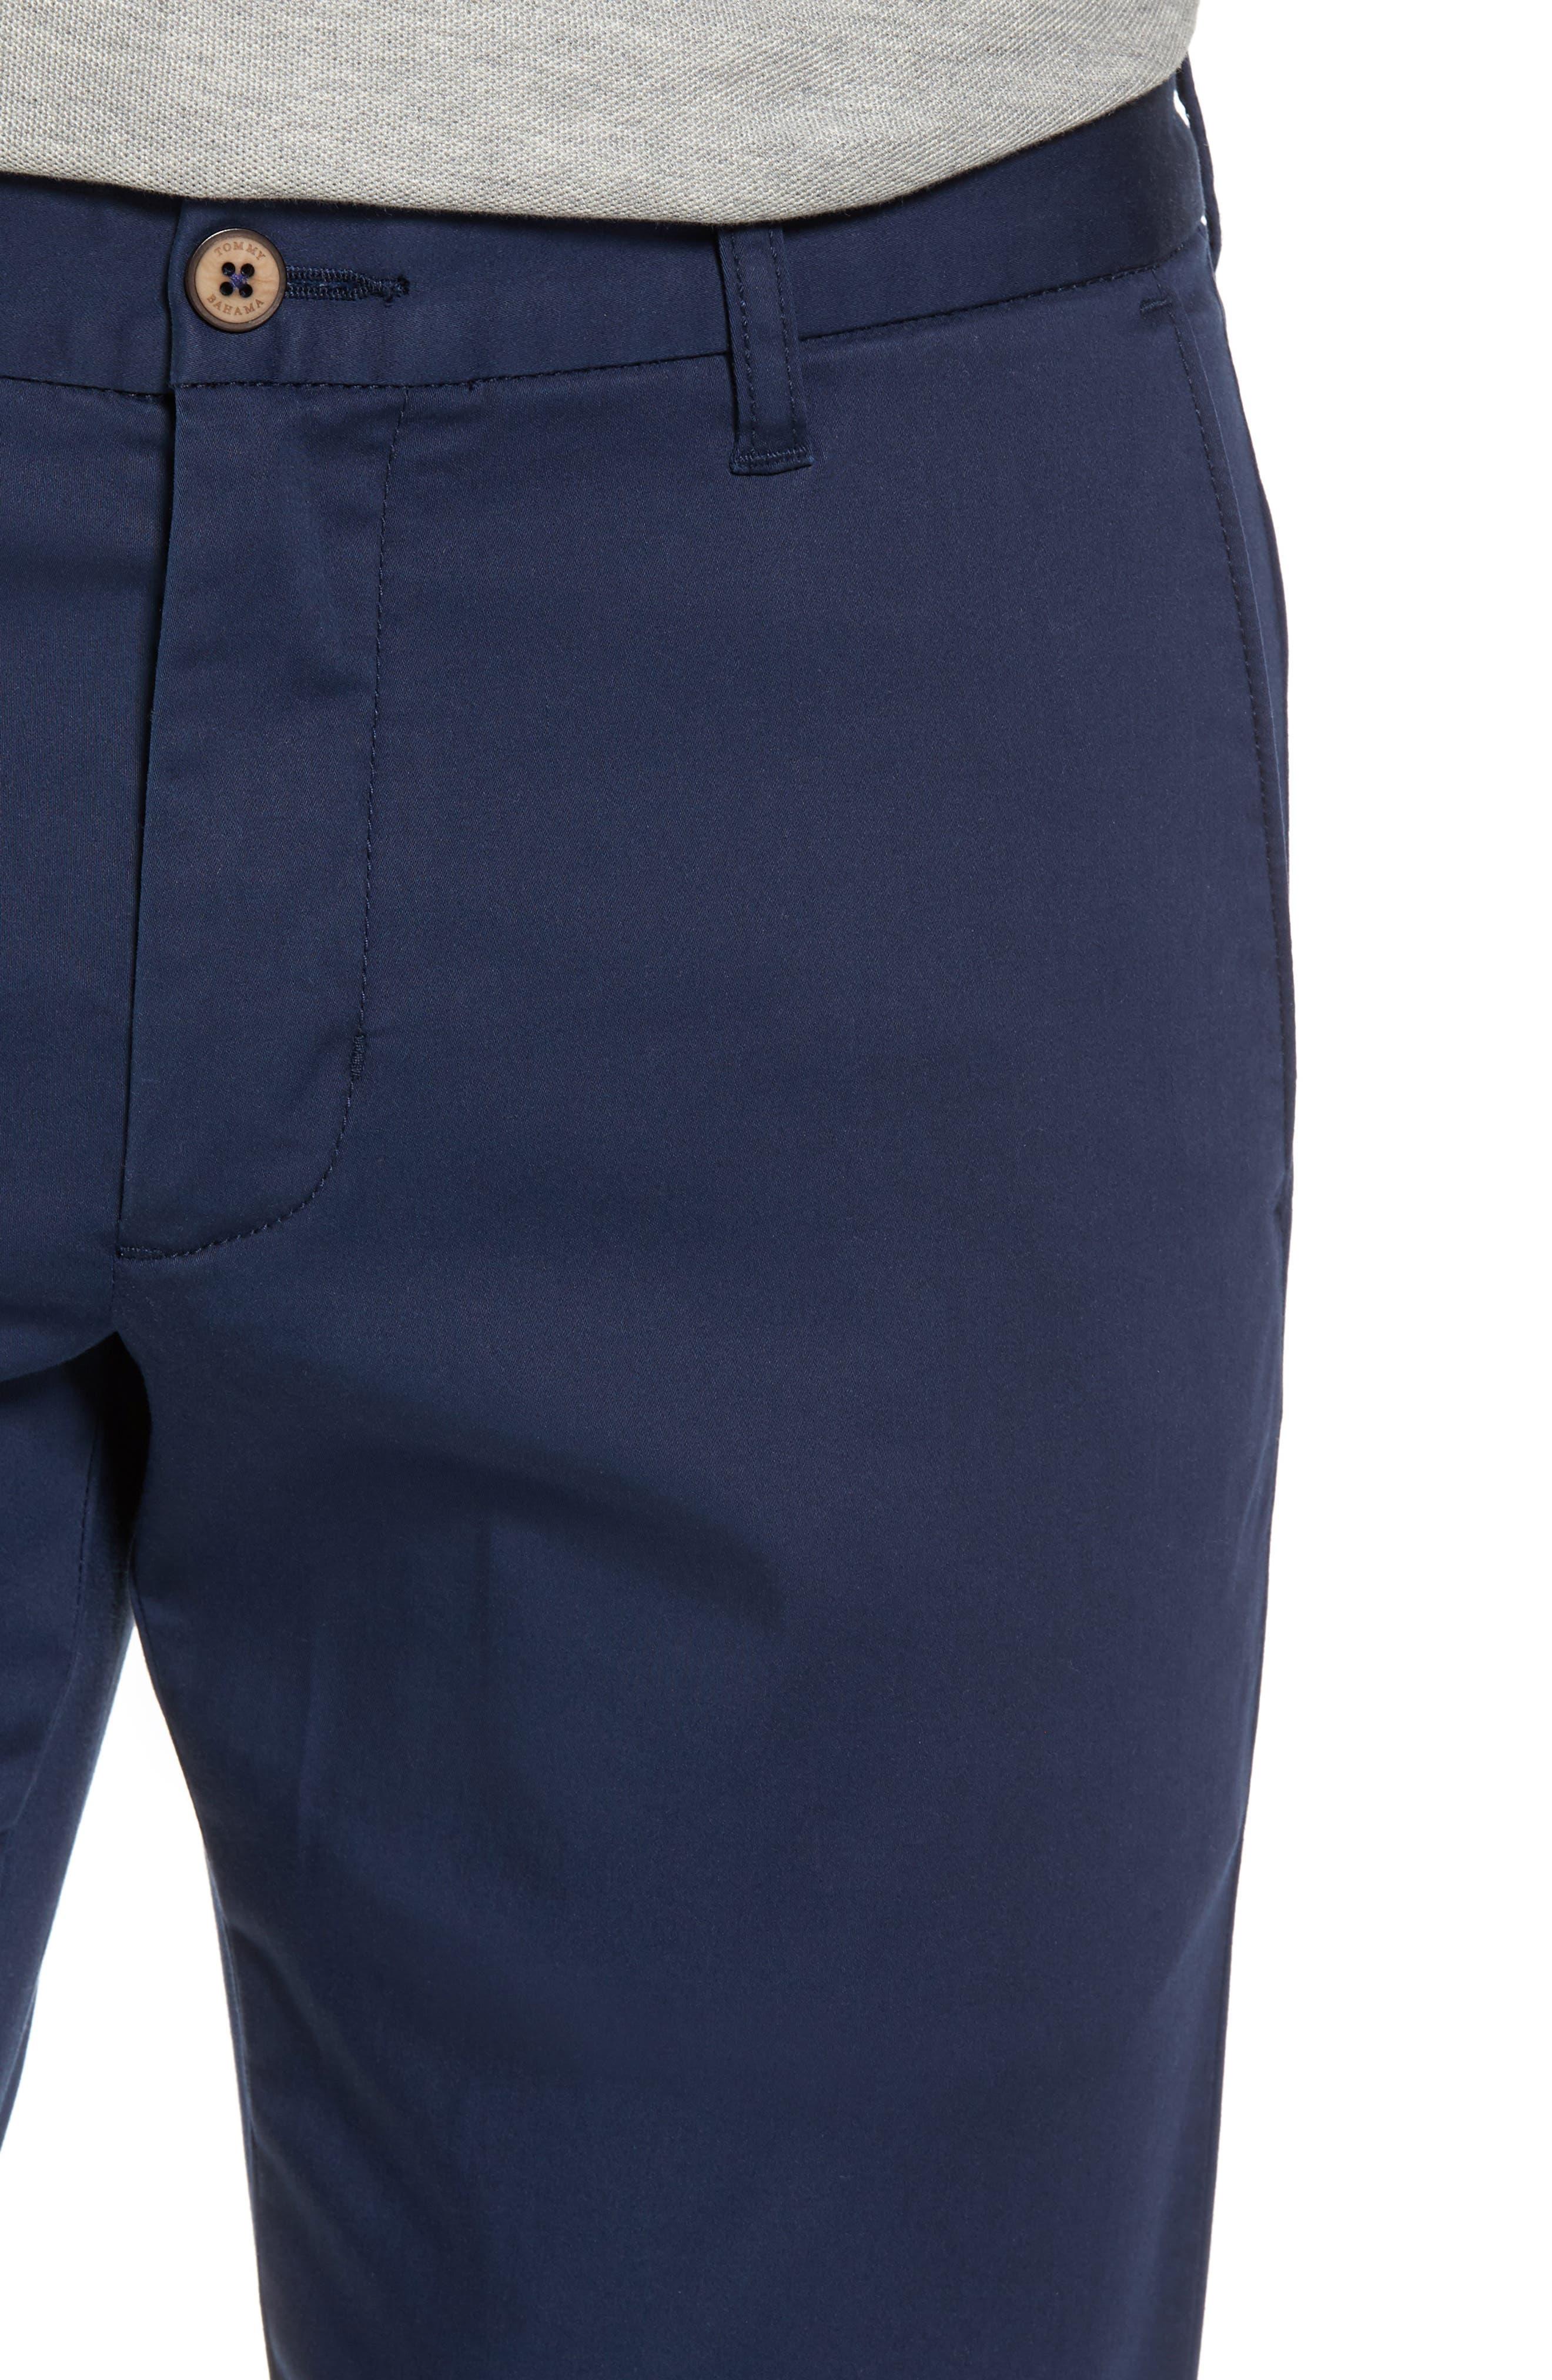 Boracay Flat Front Pants,                             Alternate thumbnail 4, color,                             Maritime